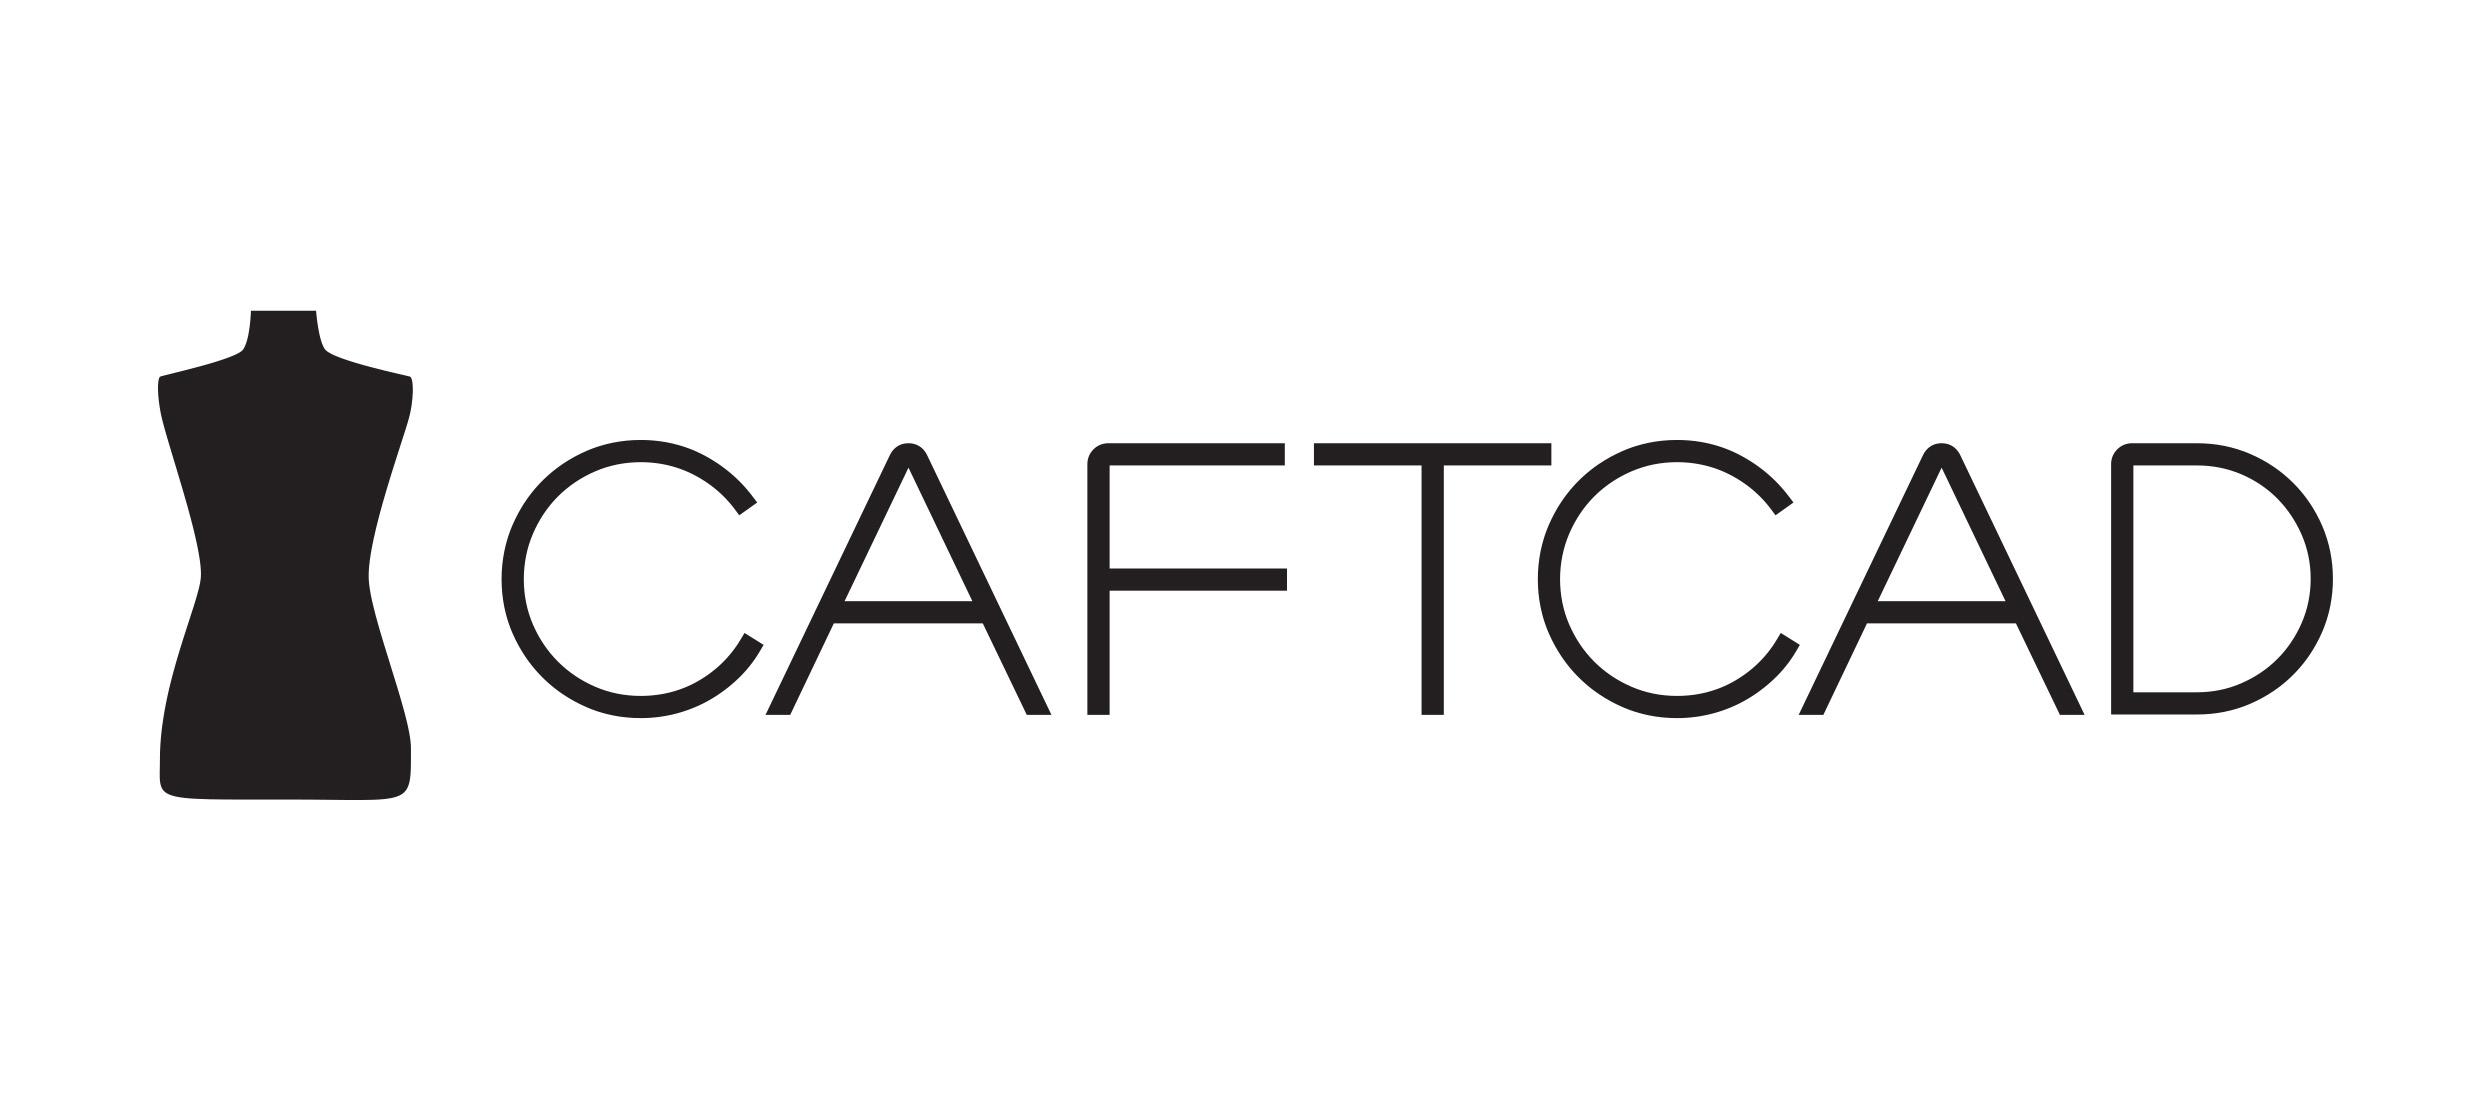 CAFTCAD large.jpg